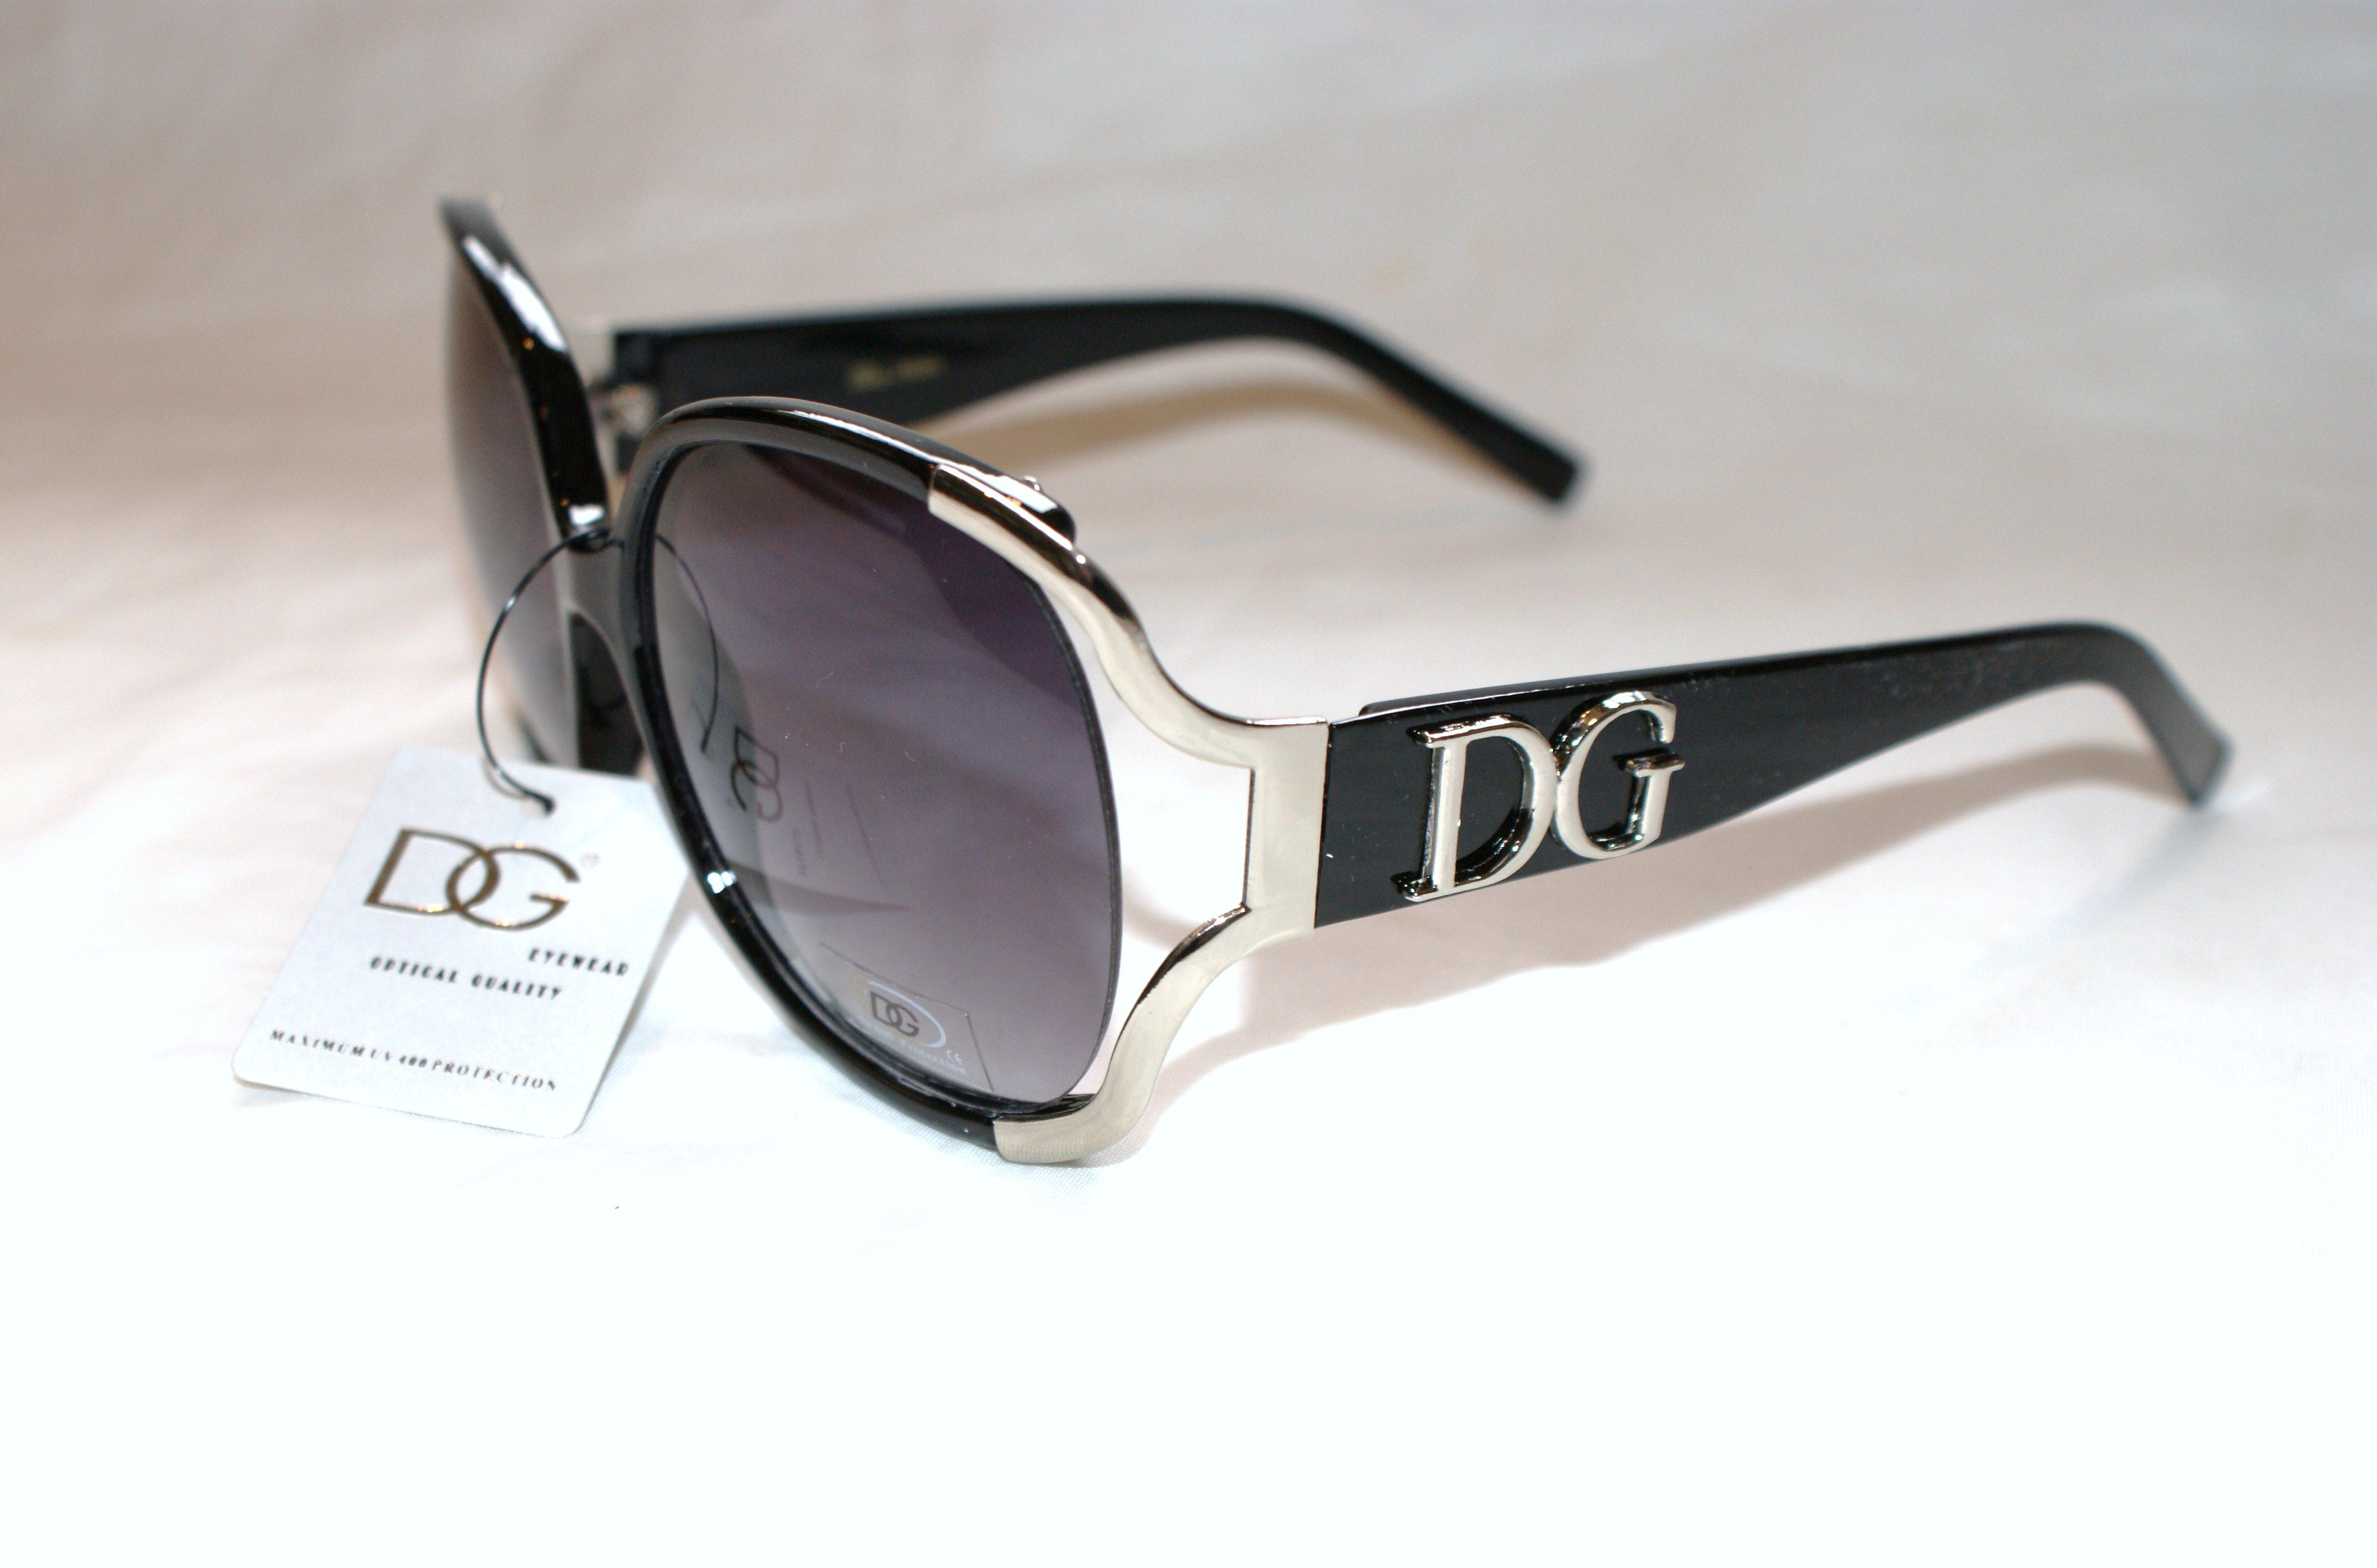 buy designer sunglasses  dg03 designer